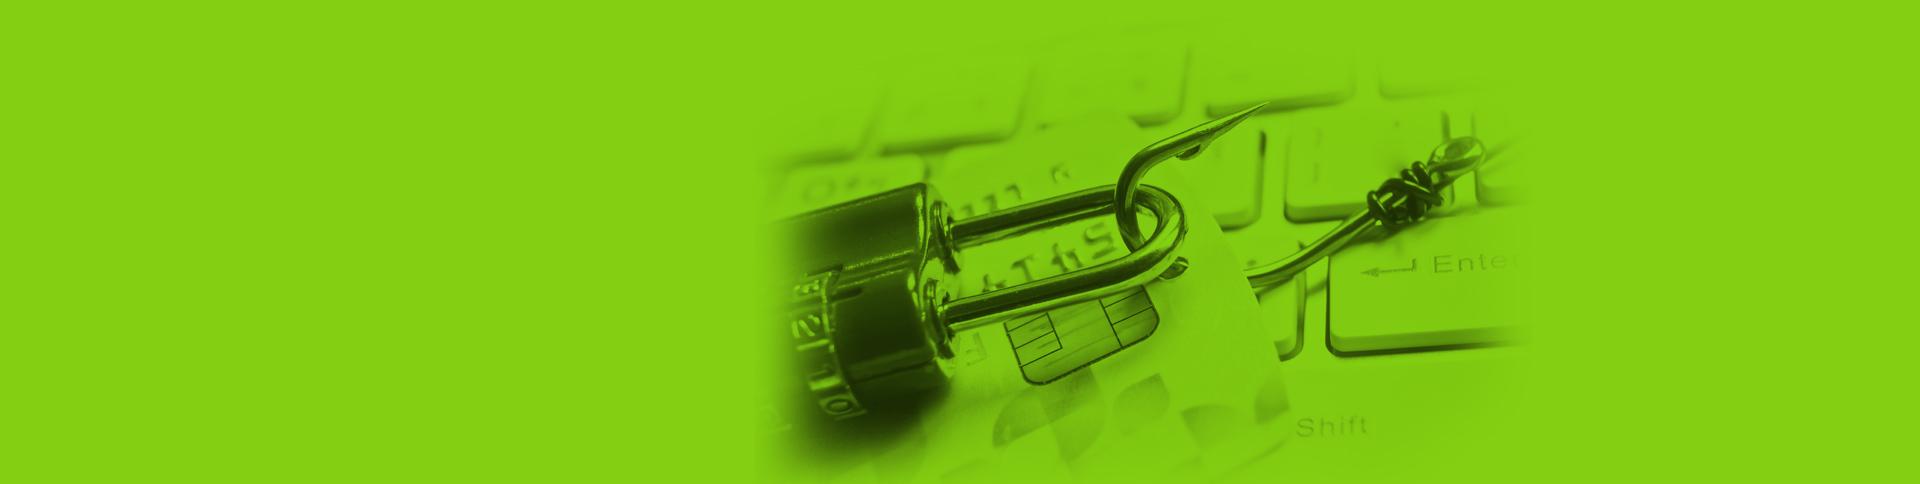 data analytics, gestion des risques et fraude